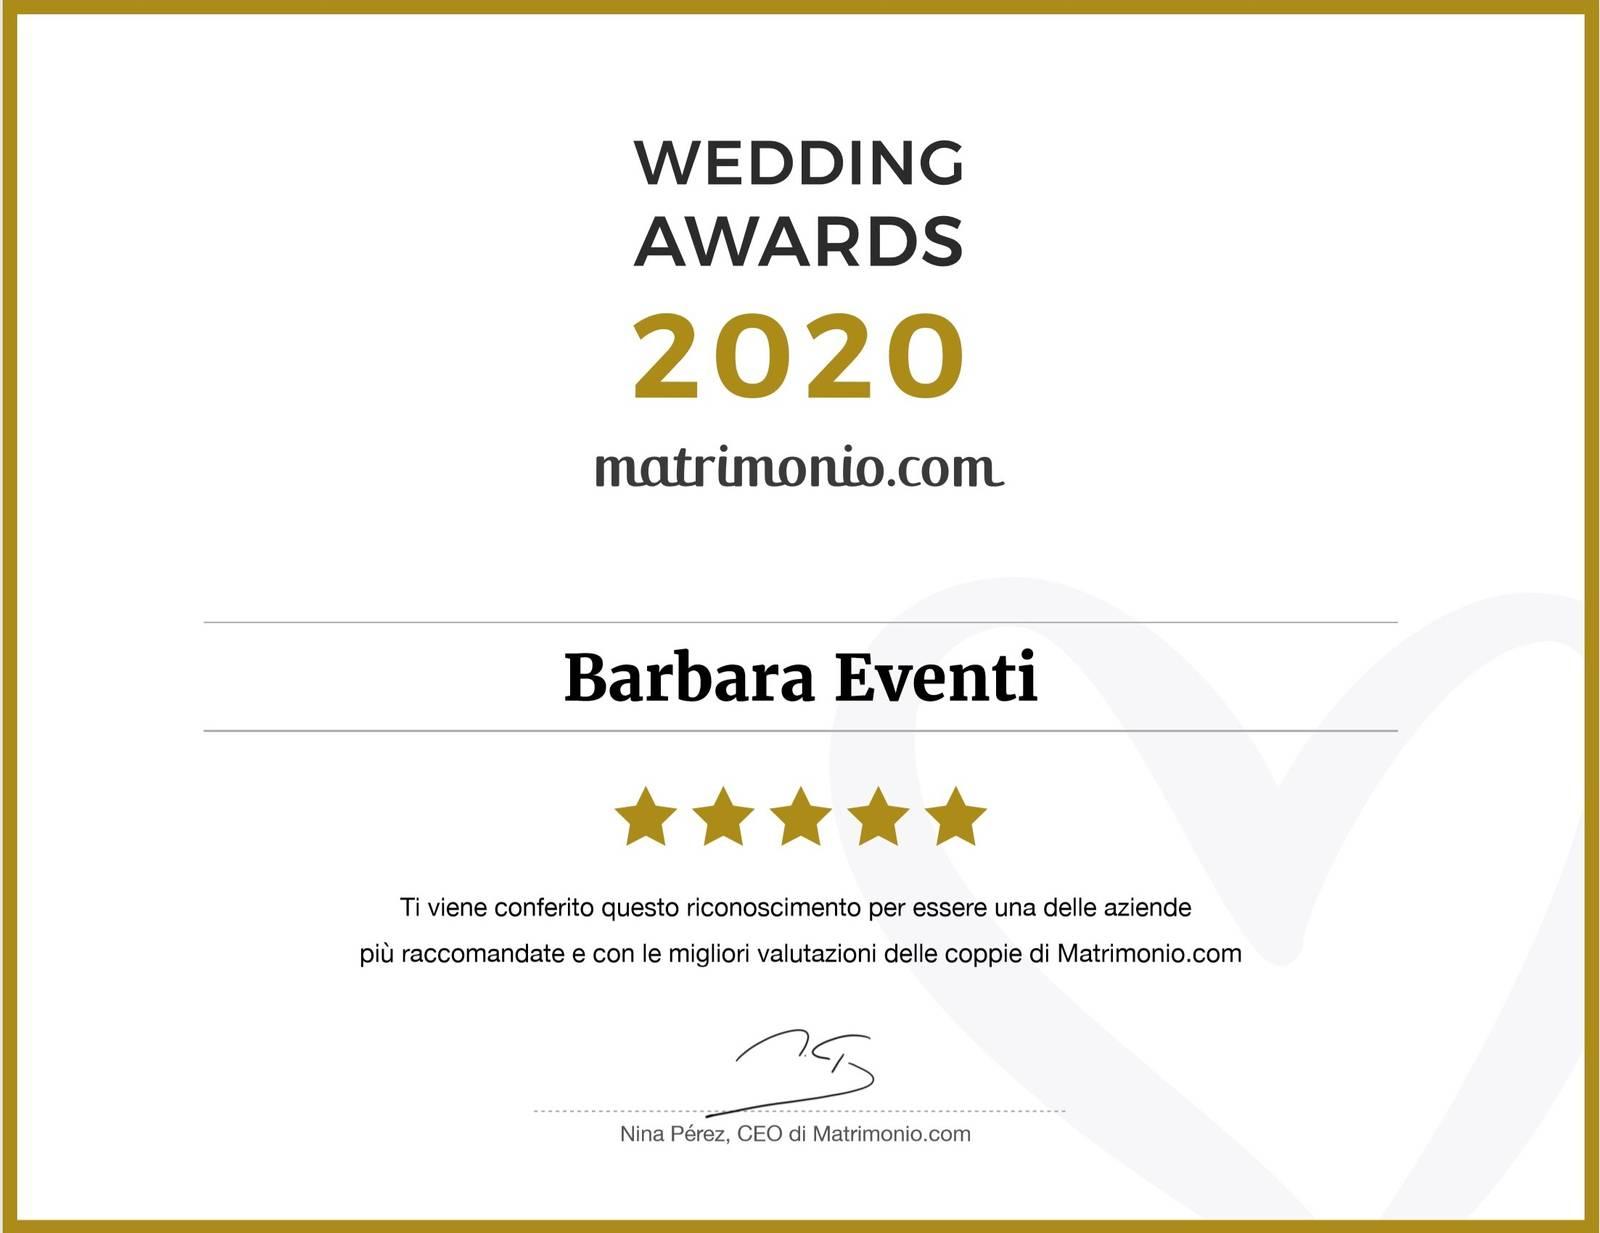 wedding awards 2020 barbara eventi